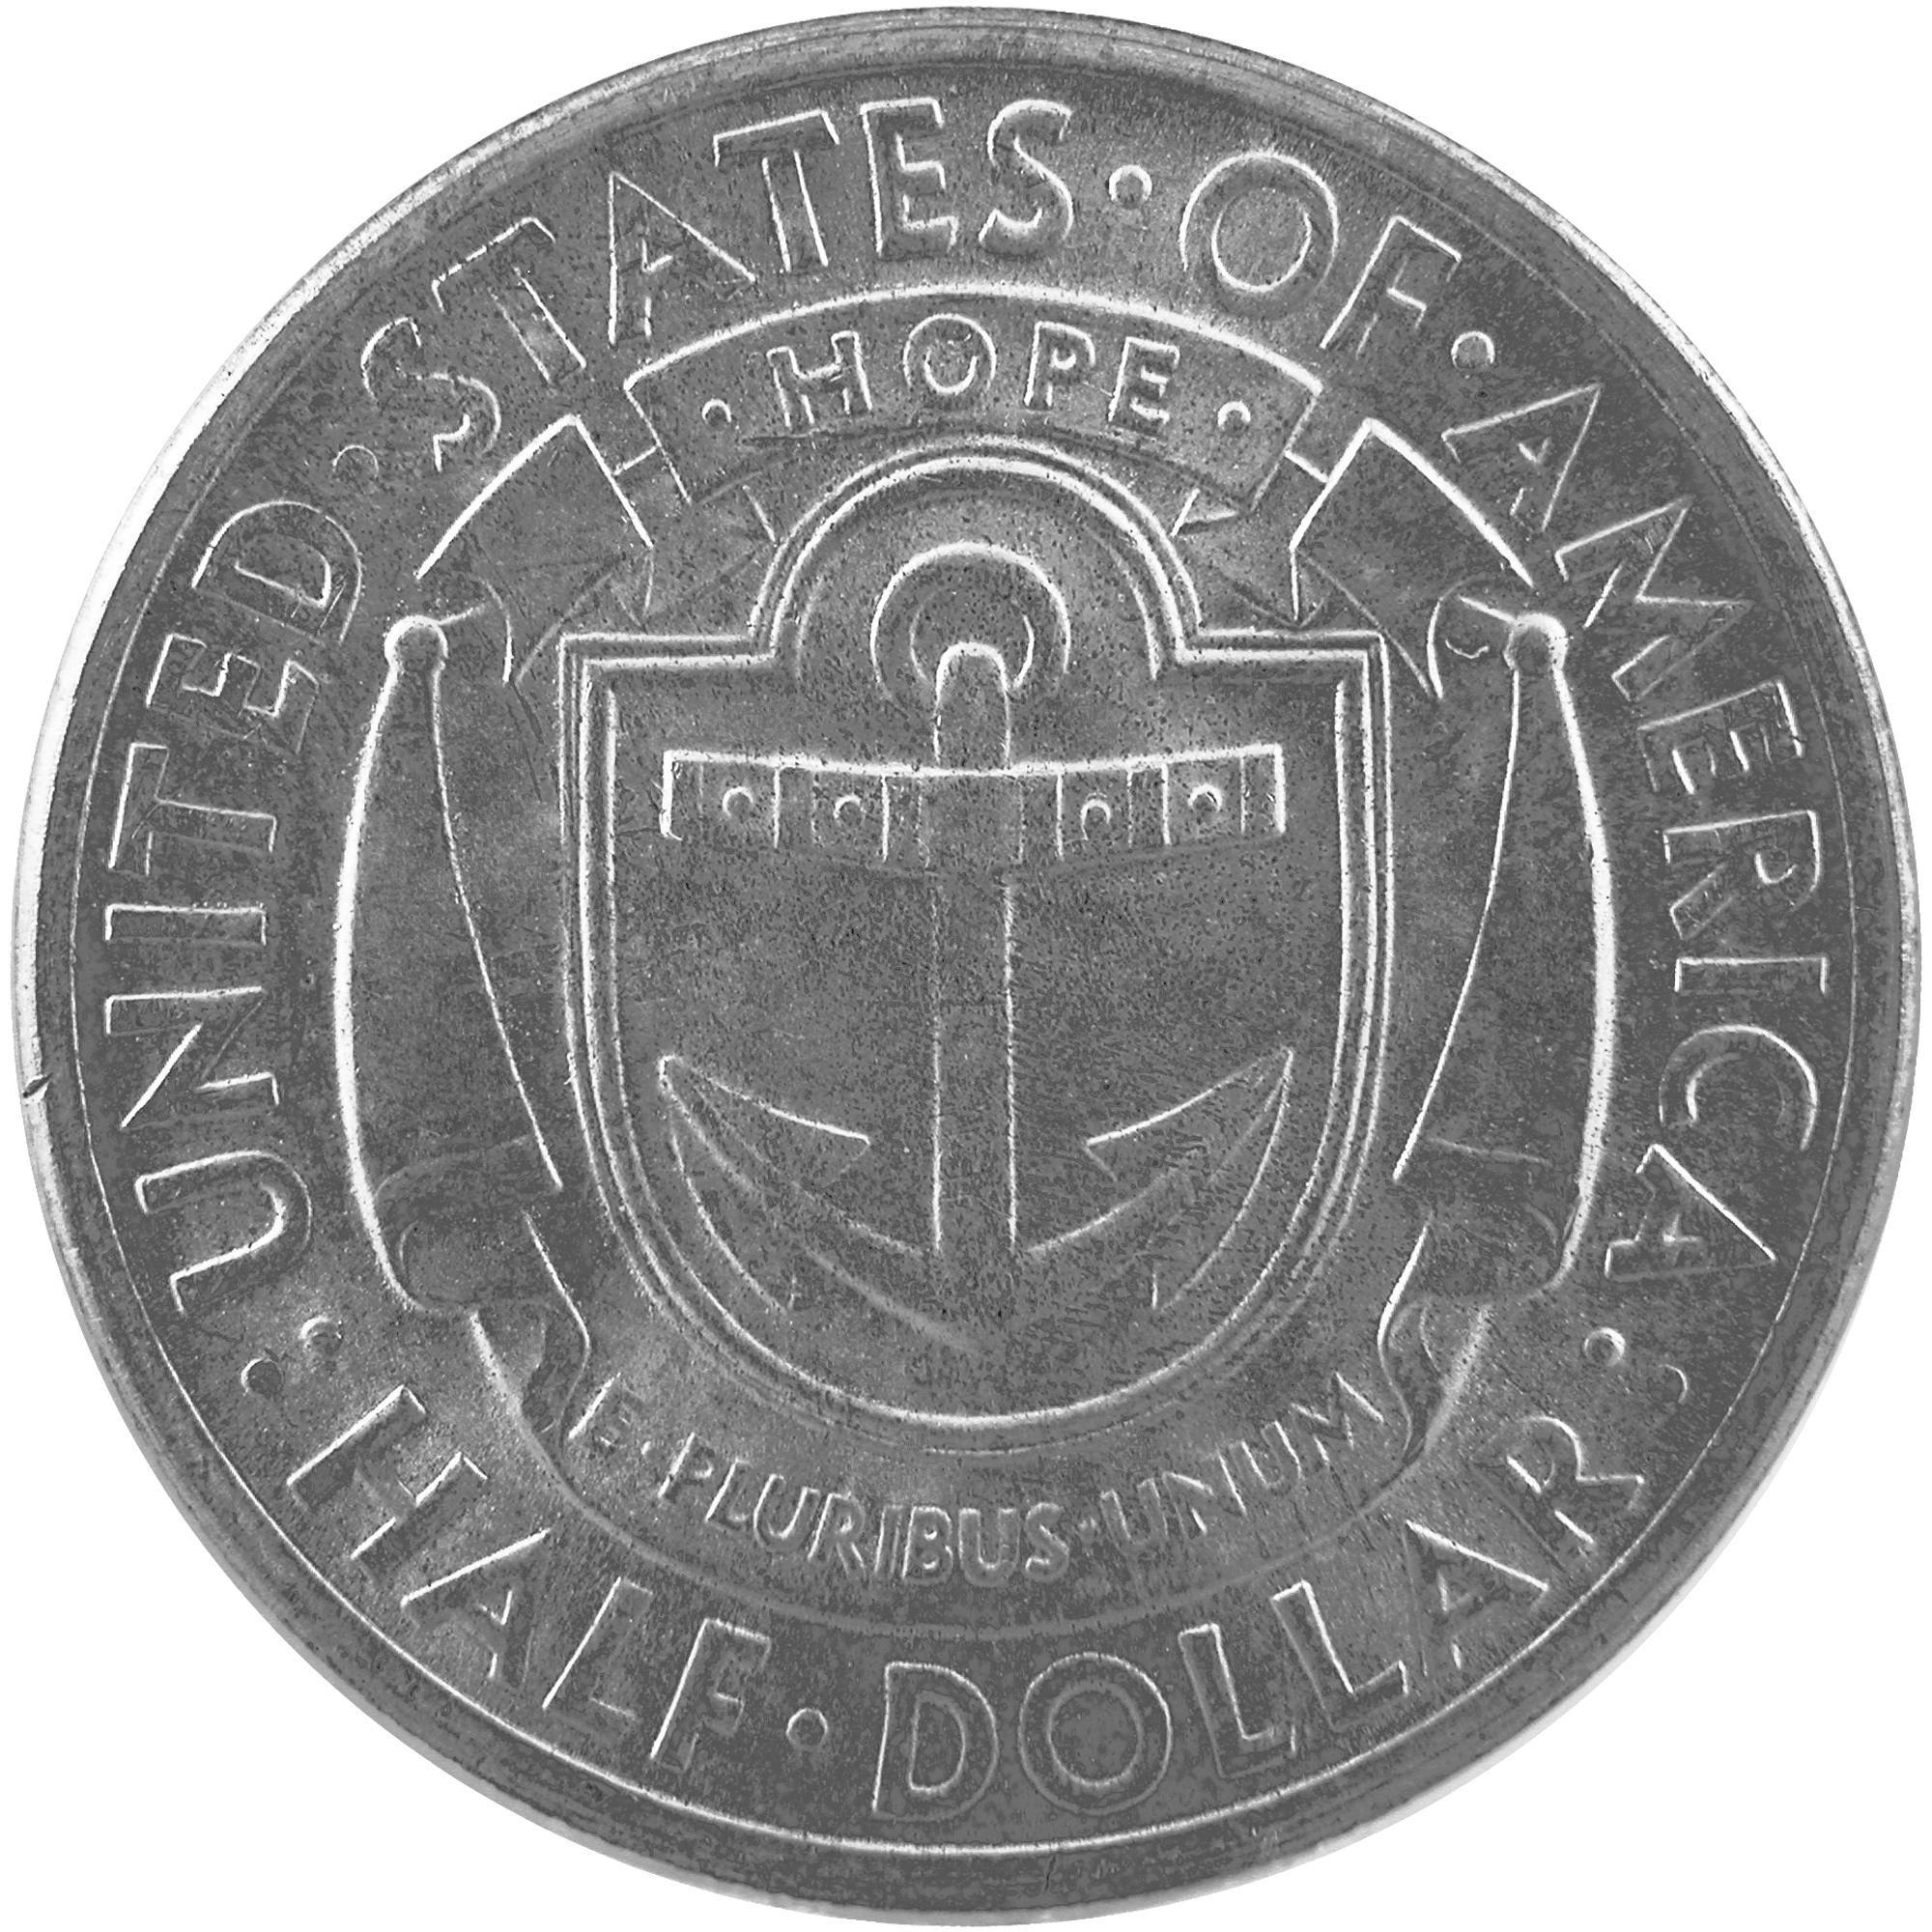 1936 Rhode Island Tercentenary Commemorative Silver Half Dollar Coin Reverse